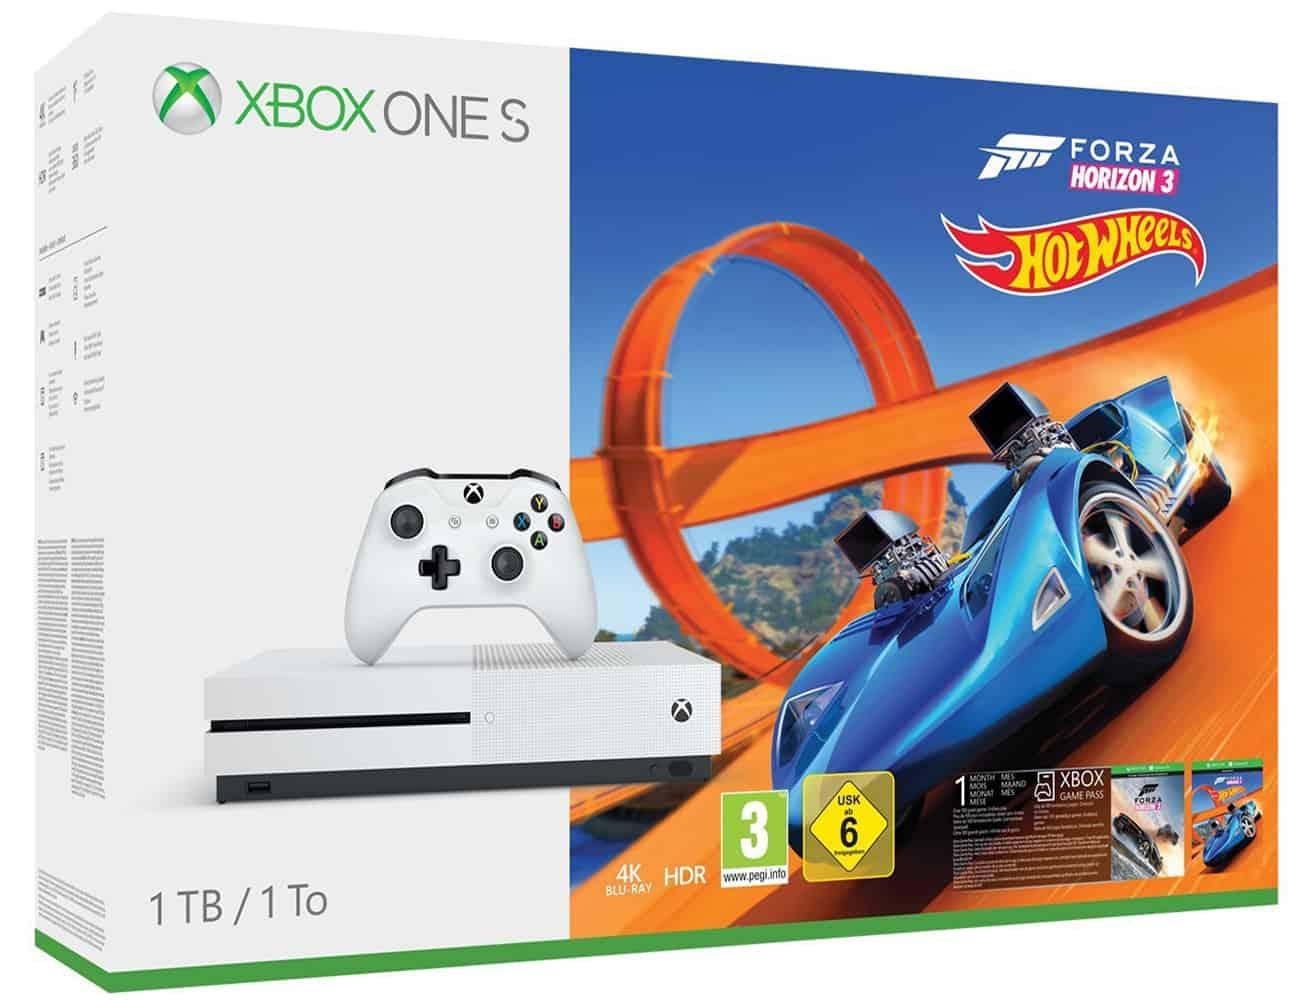 Microsoft Xbox One S 1TB Console - Forza Horizon 3 Hot Wheels Bundle